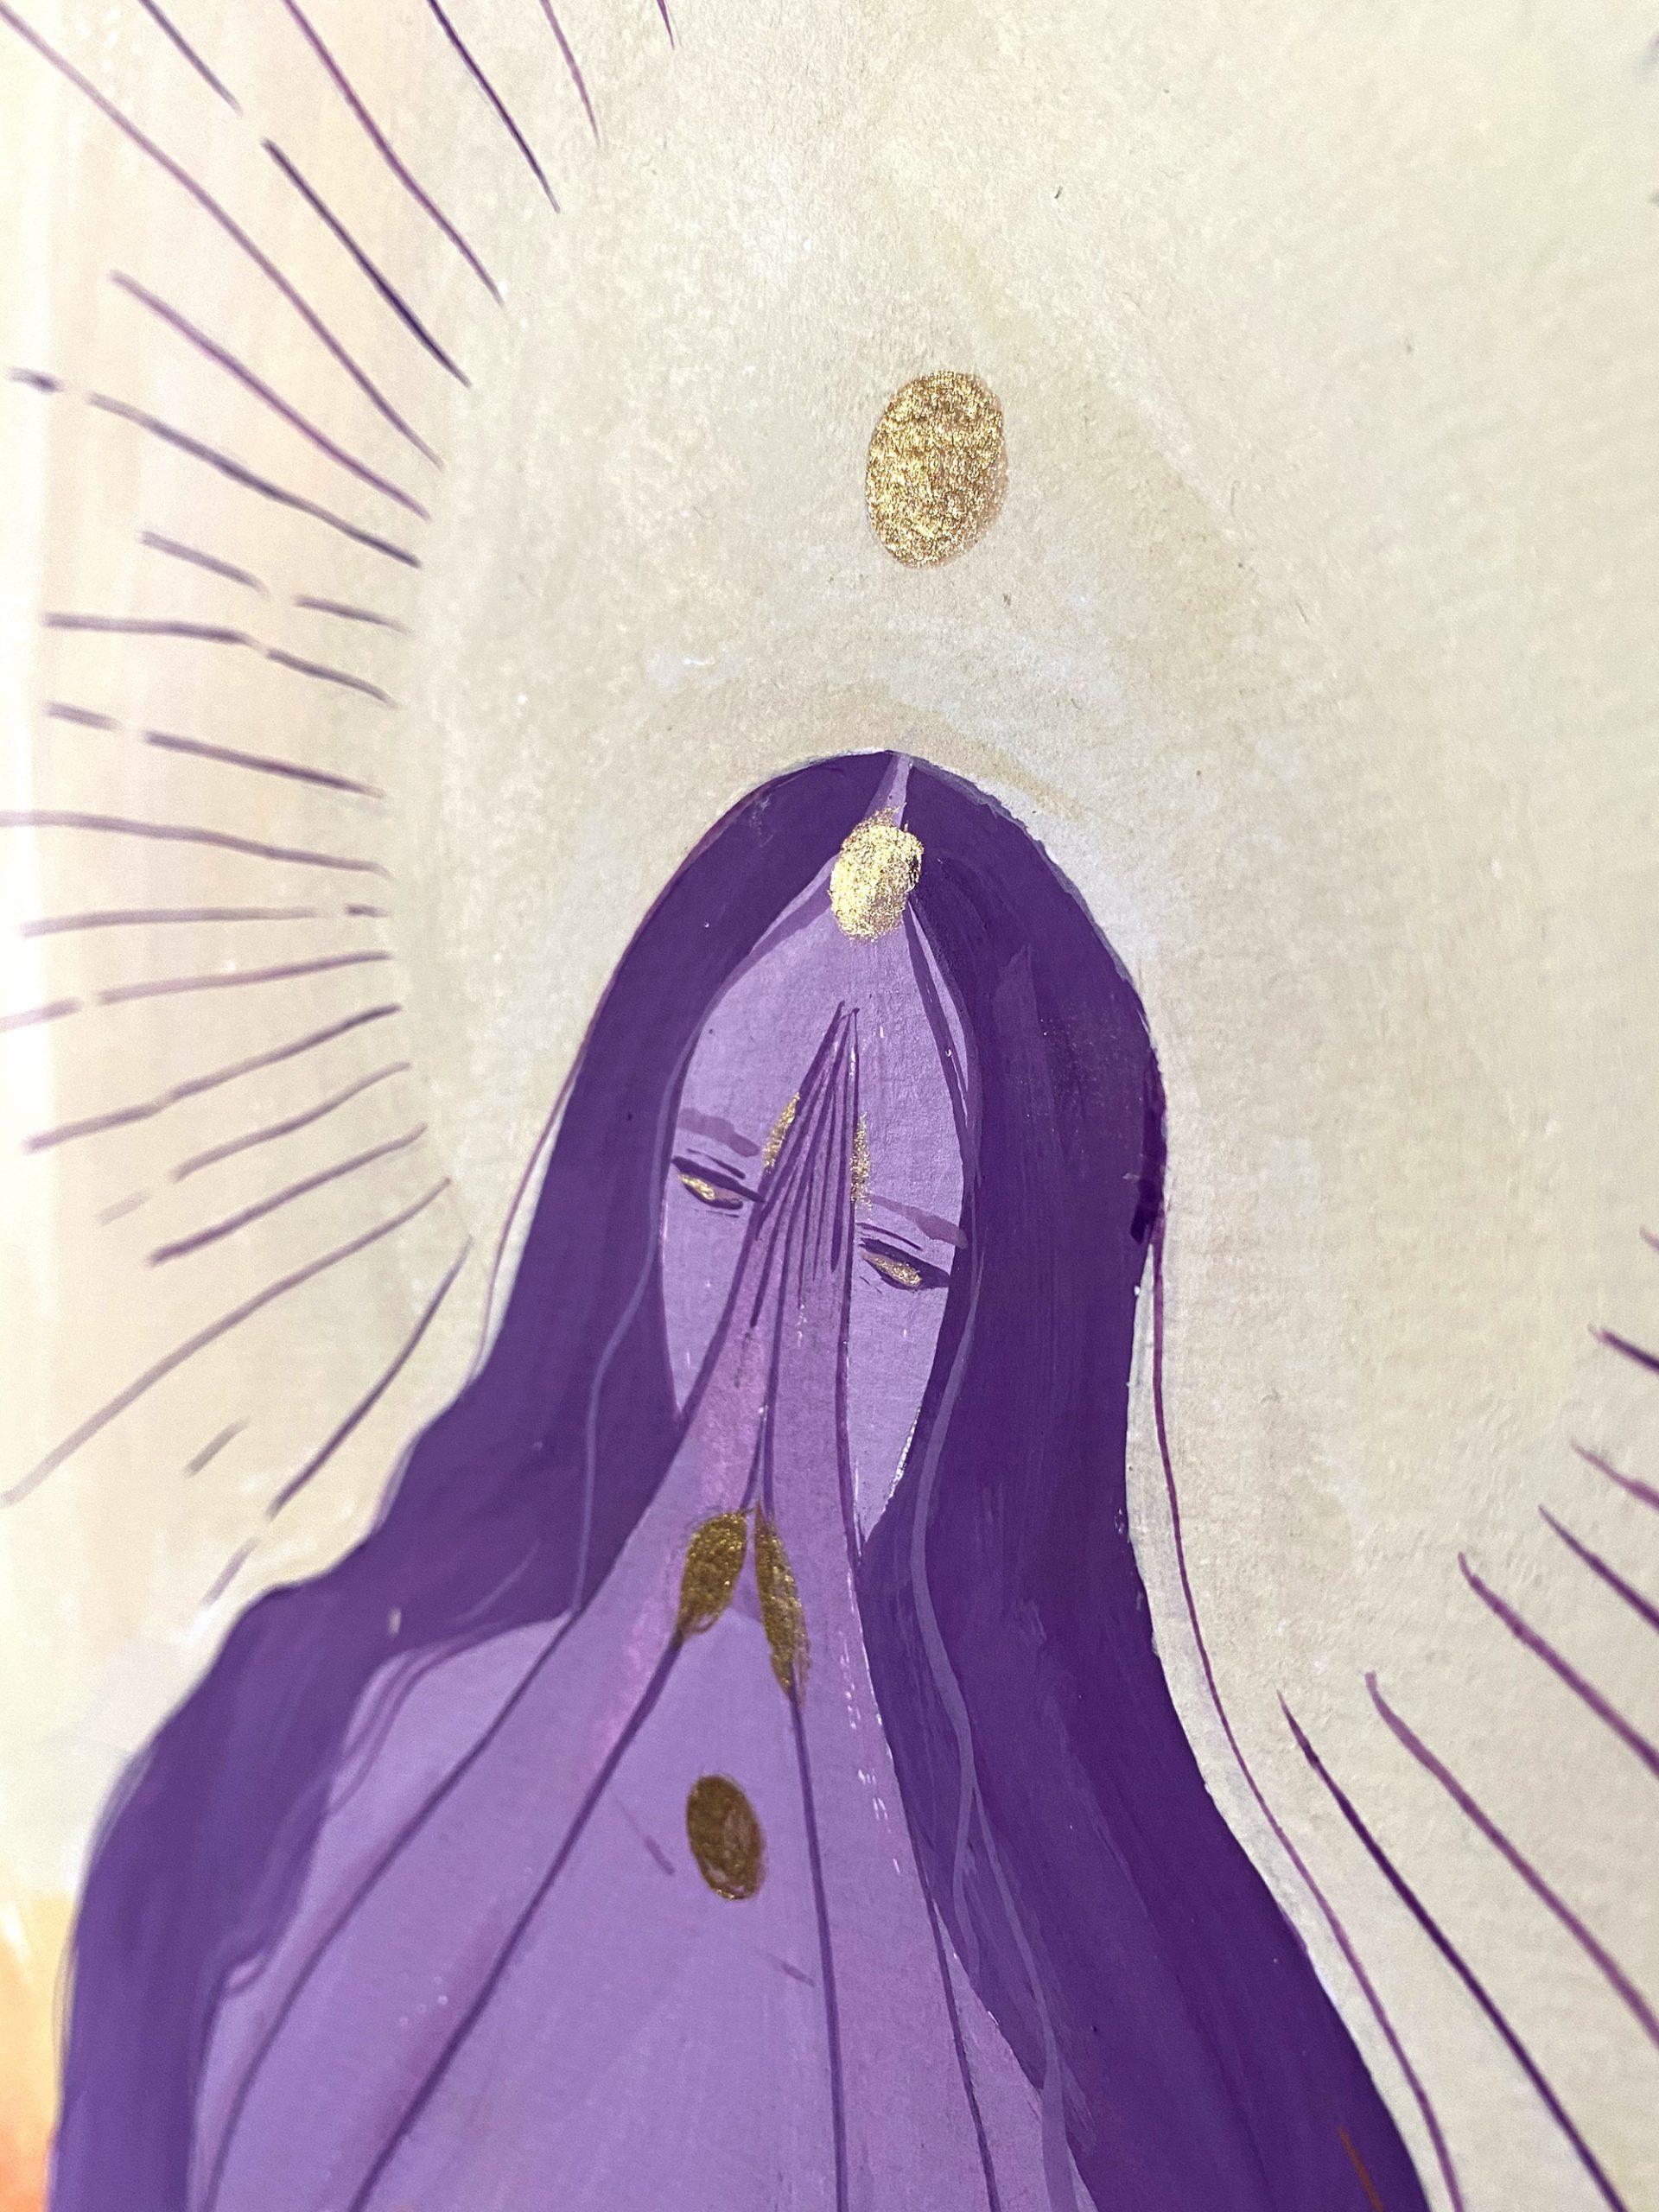 detail-zen-enlighted-purple-illustration-alice-art